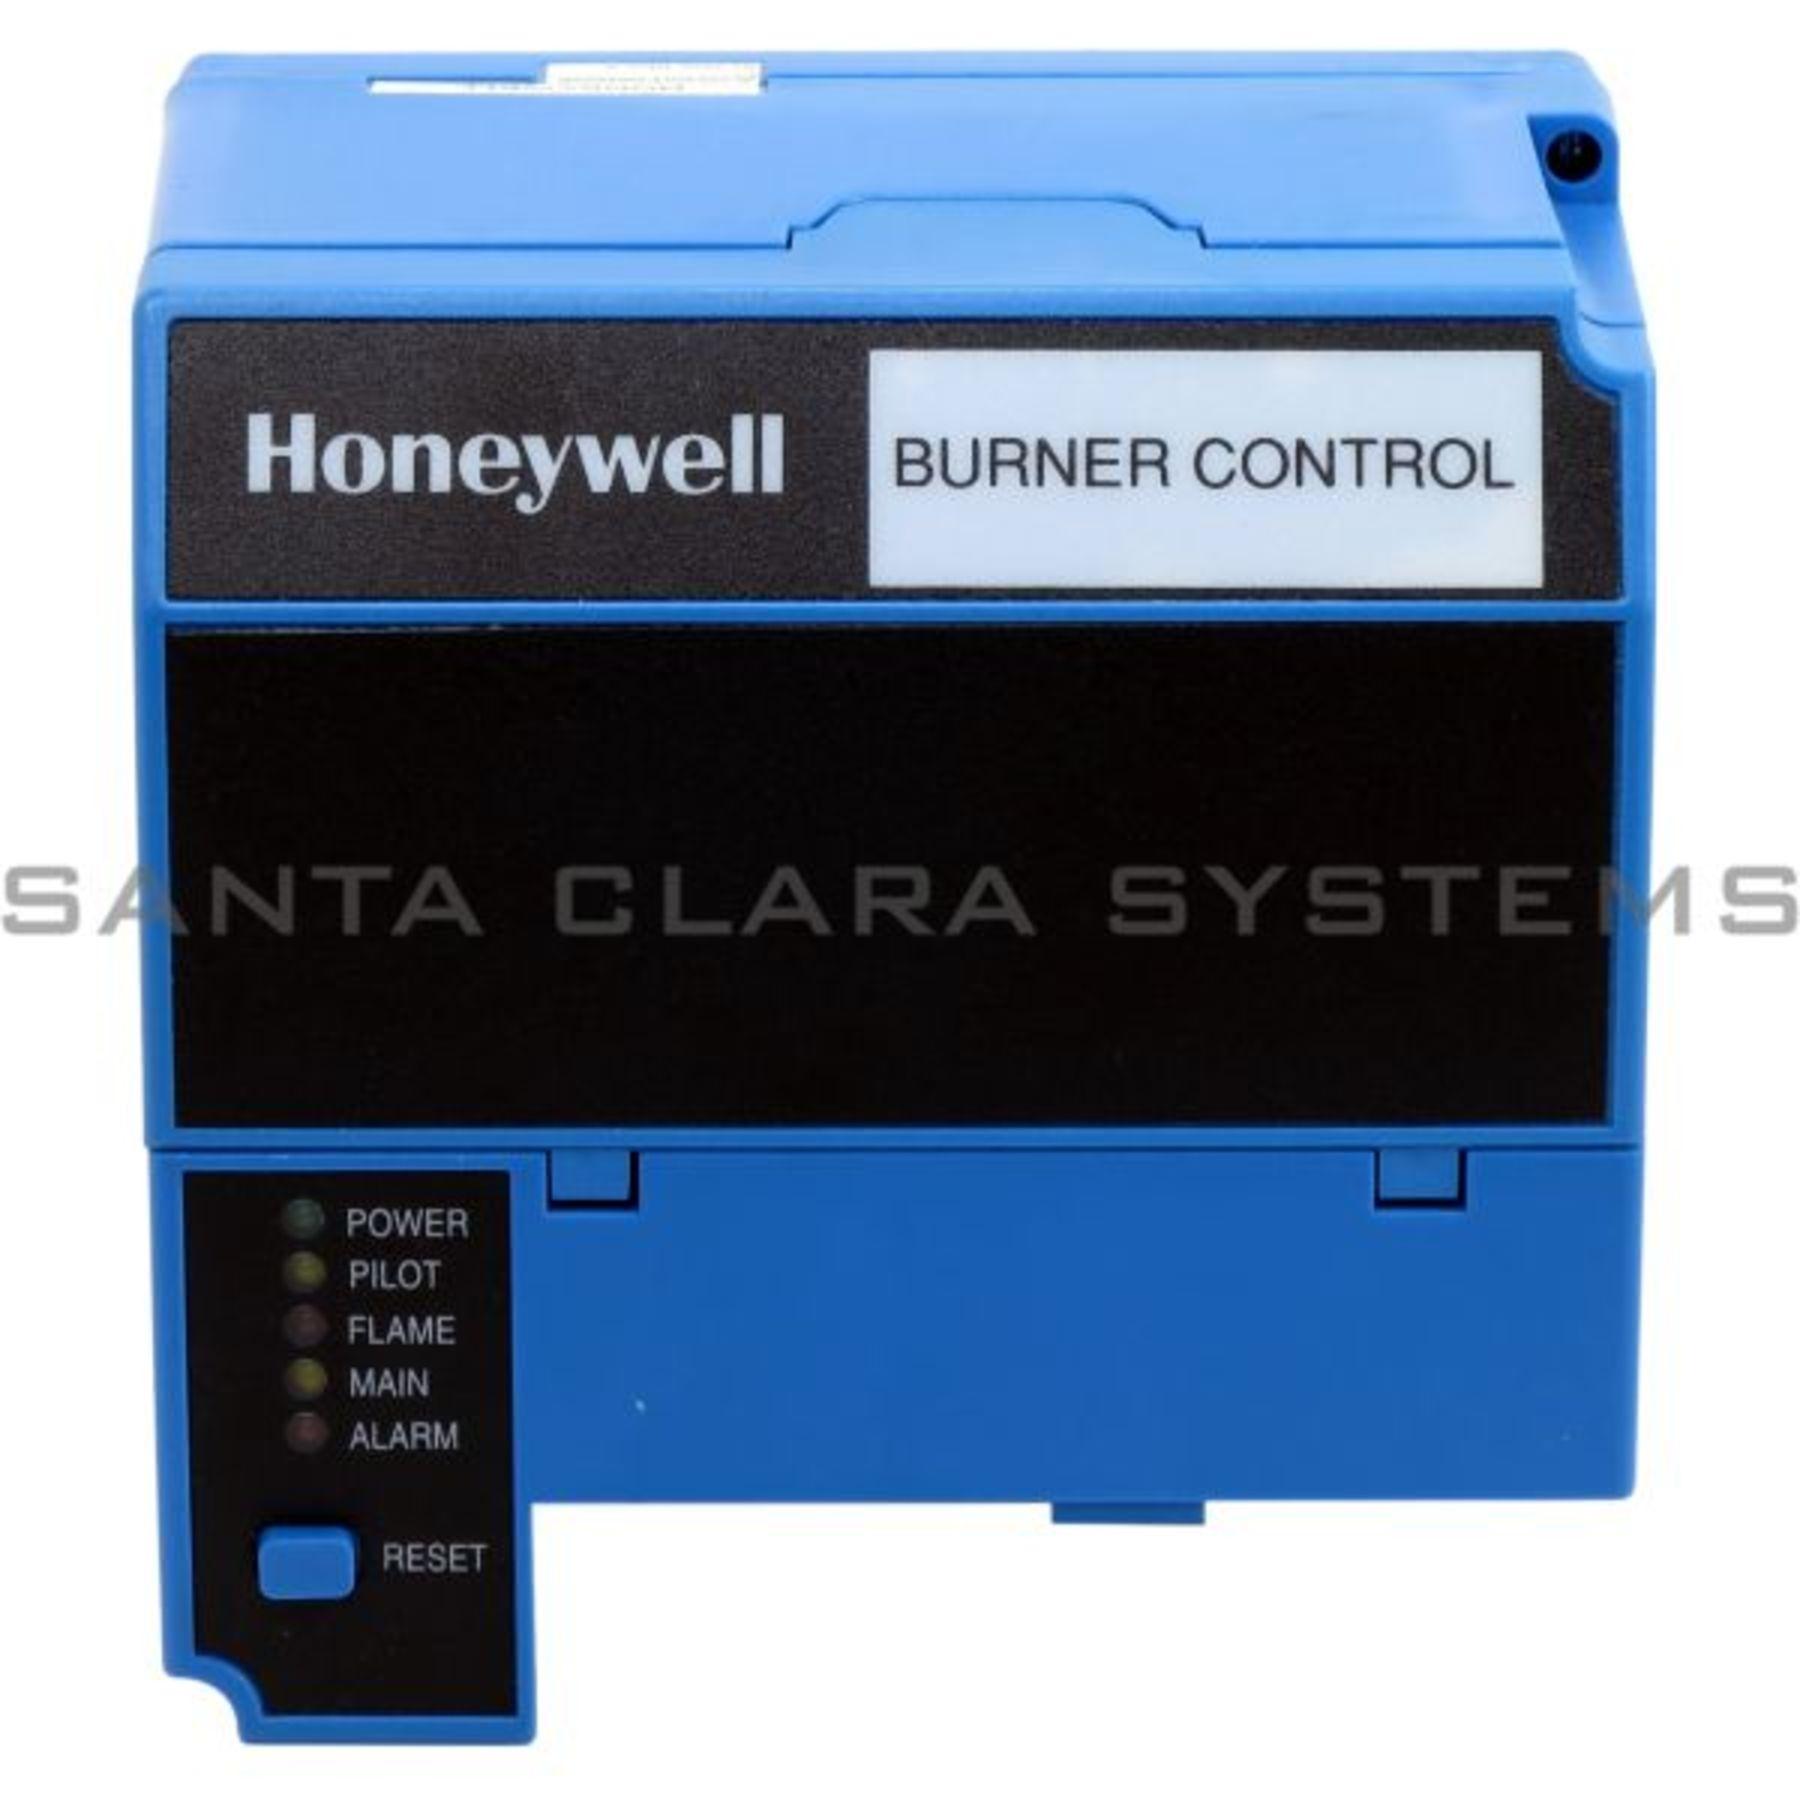 RM7895A1014 Burner Control Honeywell In Stock - Santa Clara Systems